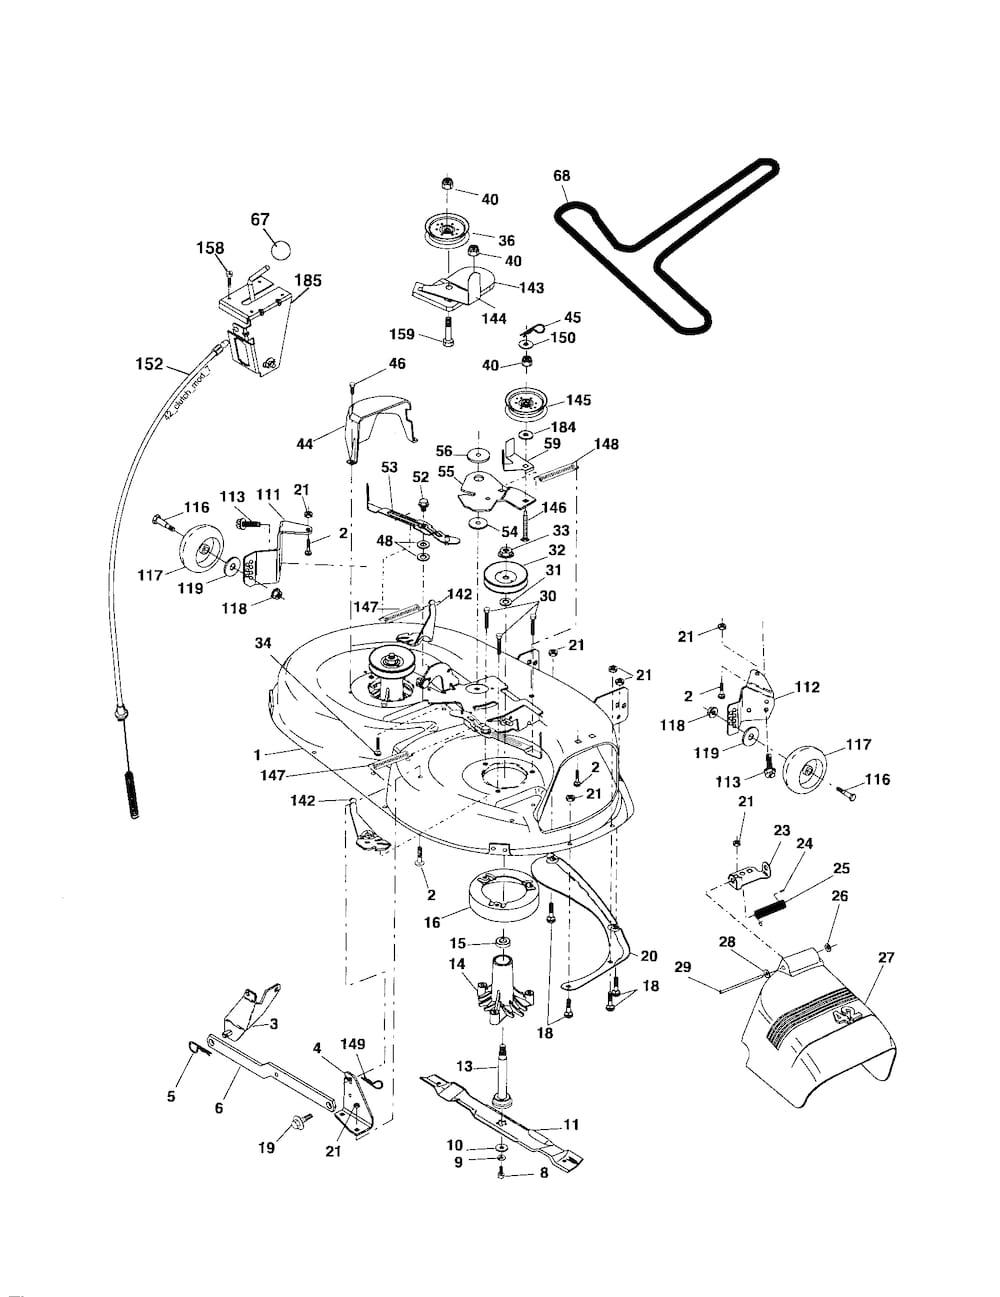 Poulan Tractor model # PB19H42LT